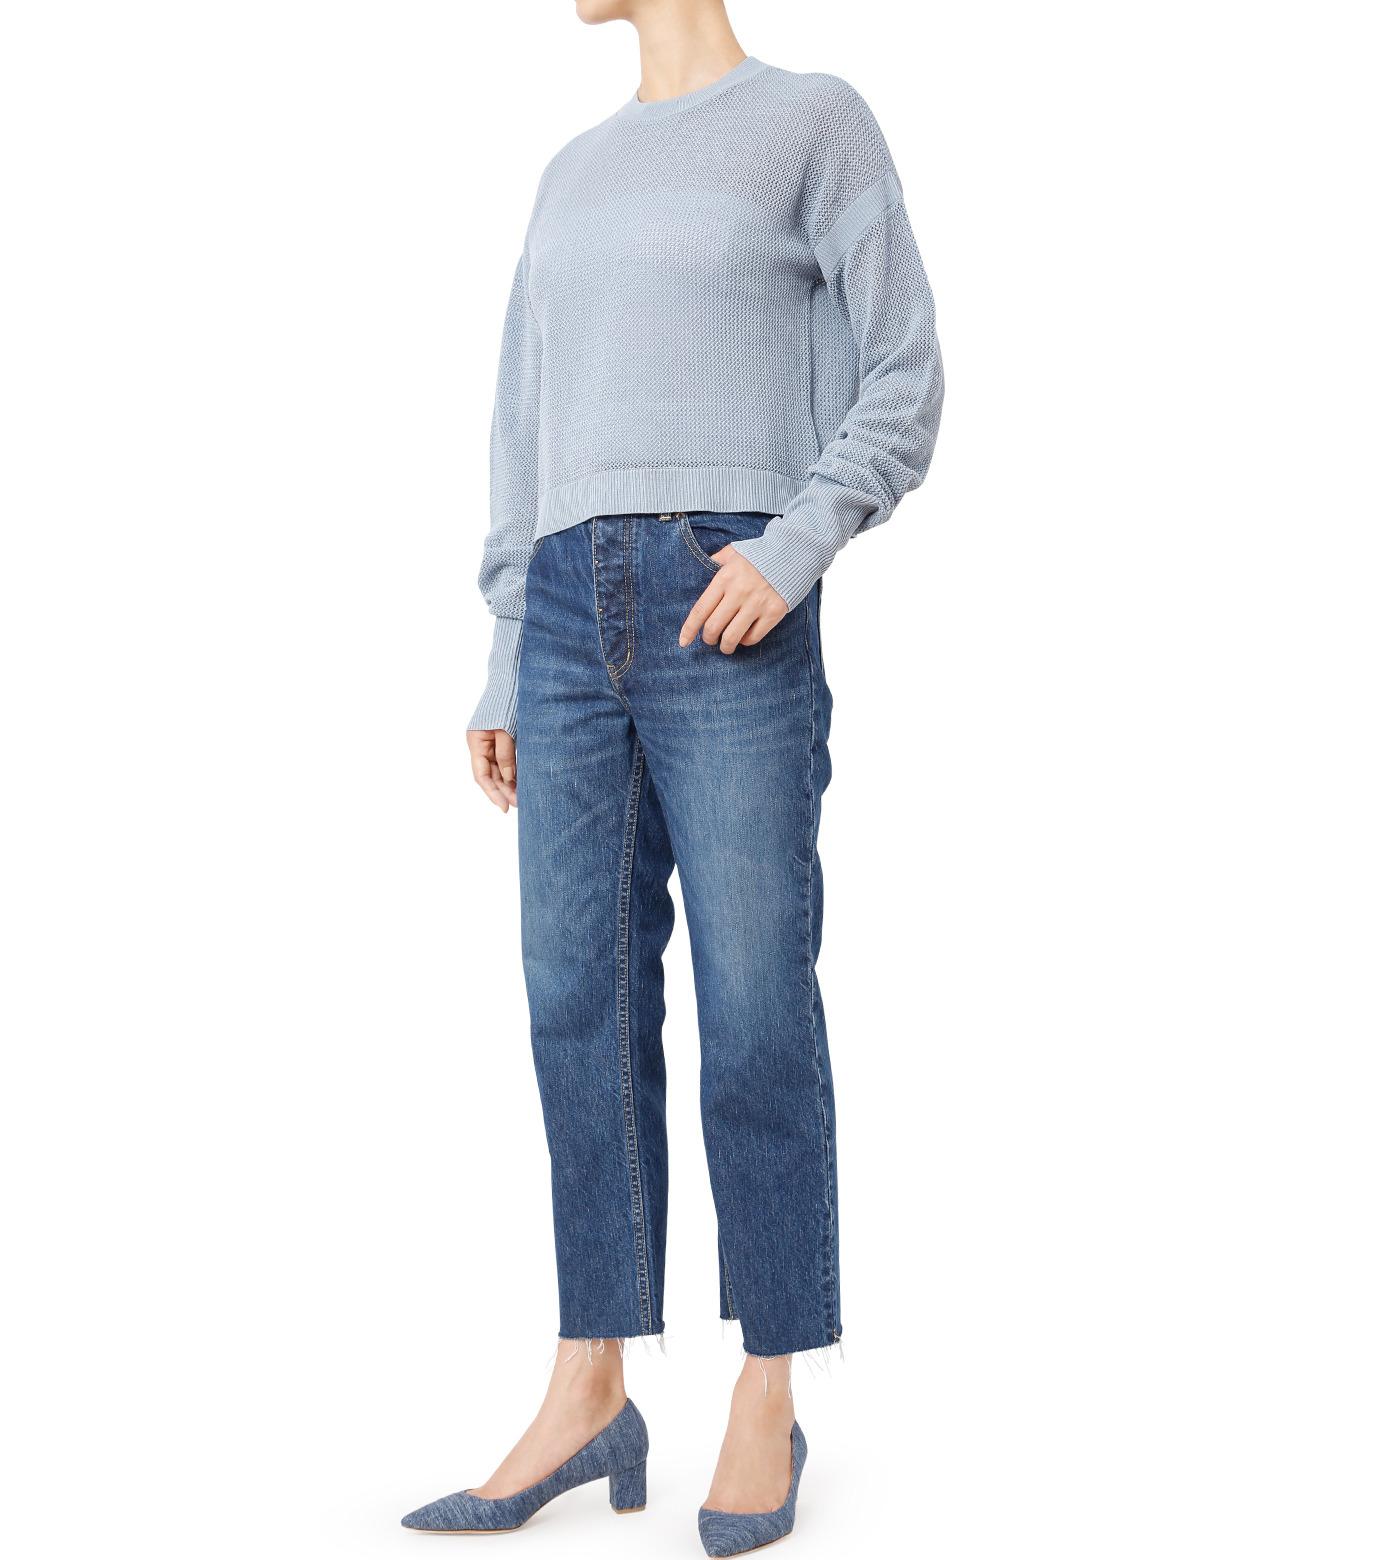 LE CIEL BLEU(ルシェルブルー)のストレートデニムパンツ-INDIGO(パンツ/pants)-18A68202 拡大詳細画像3